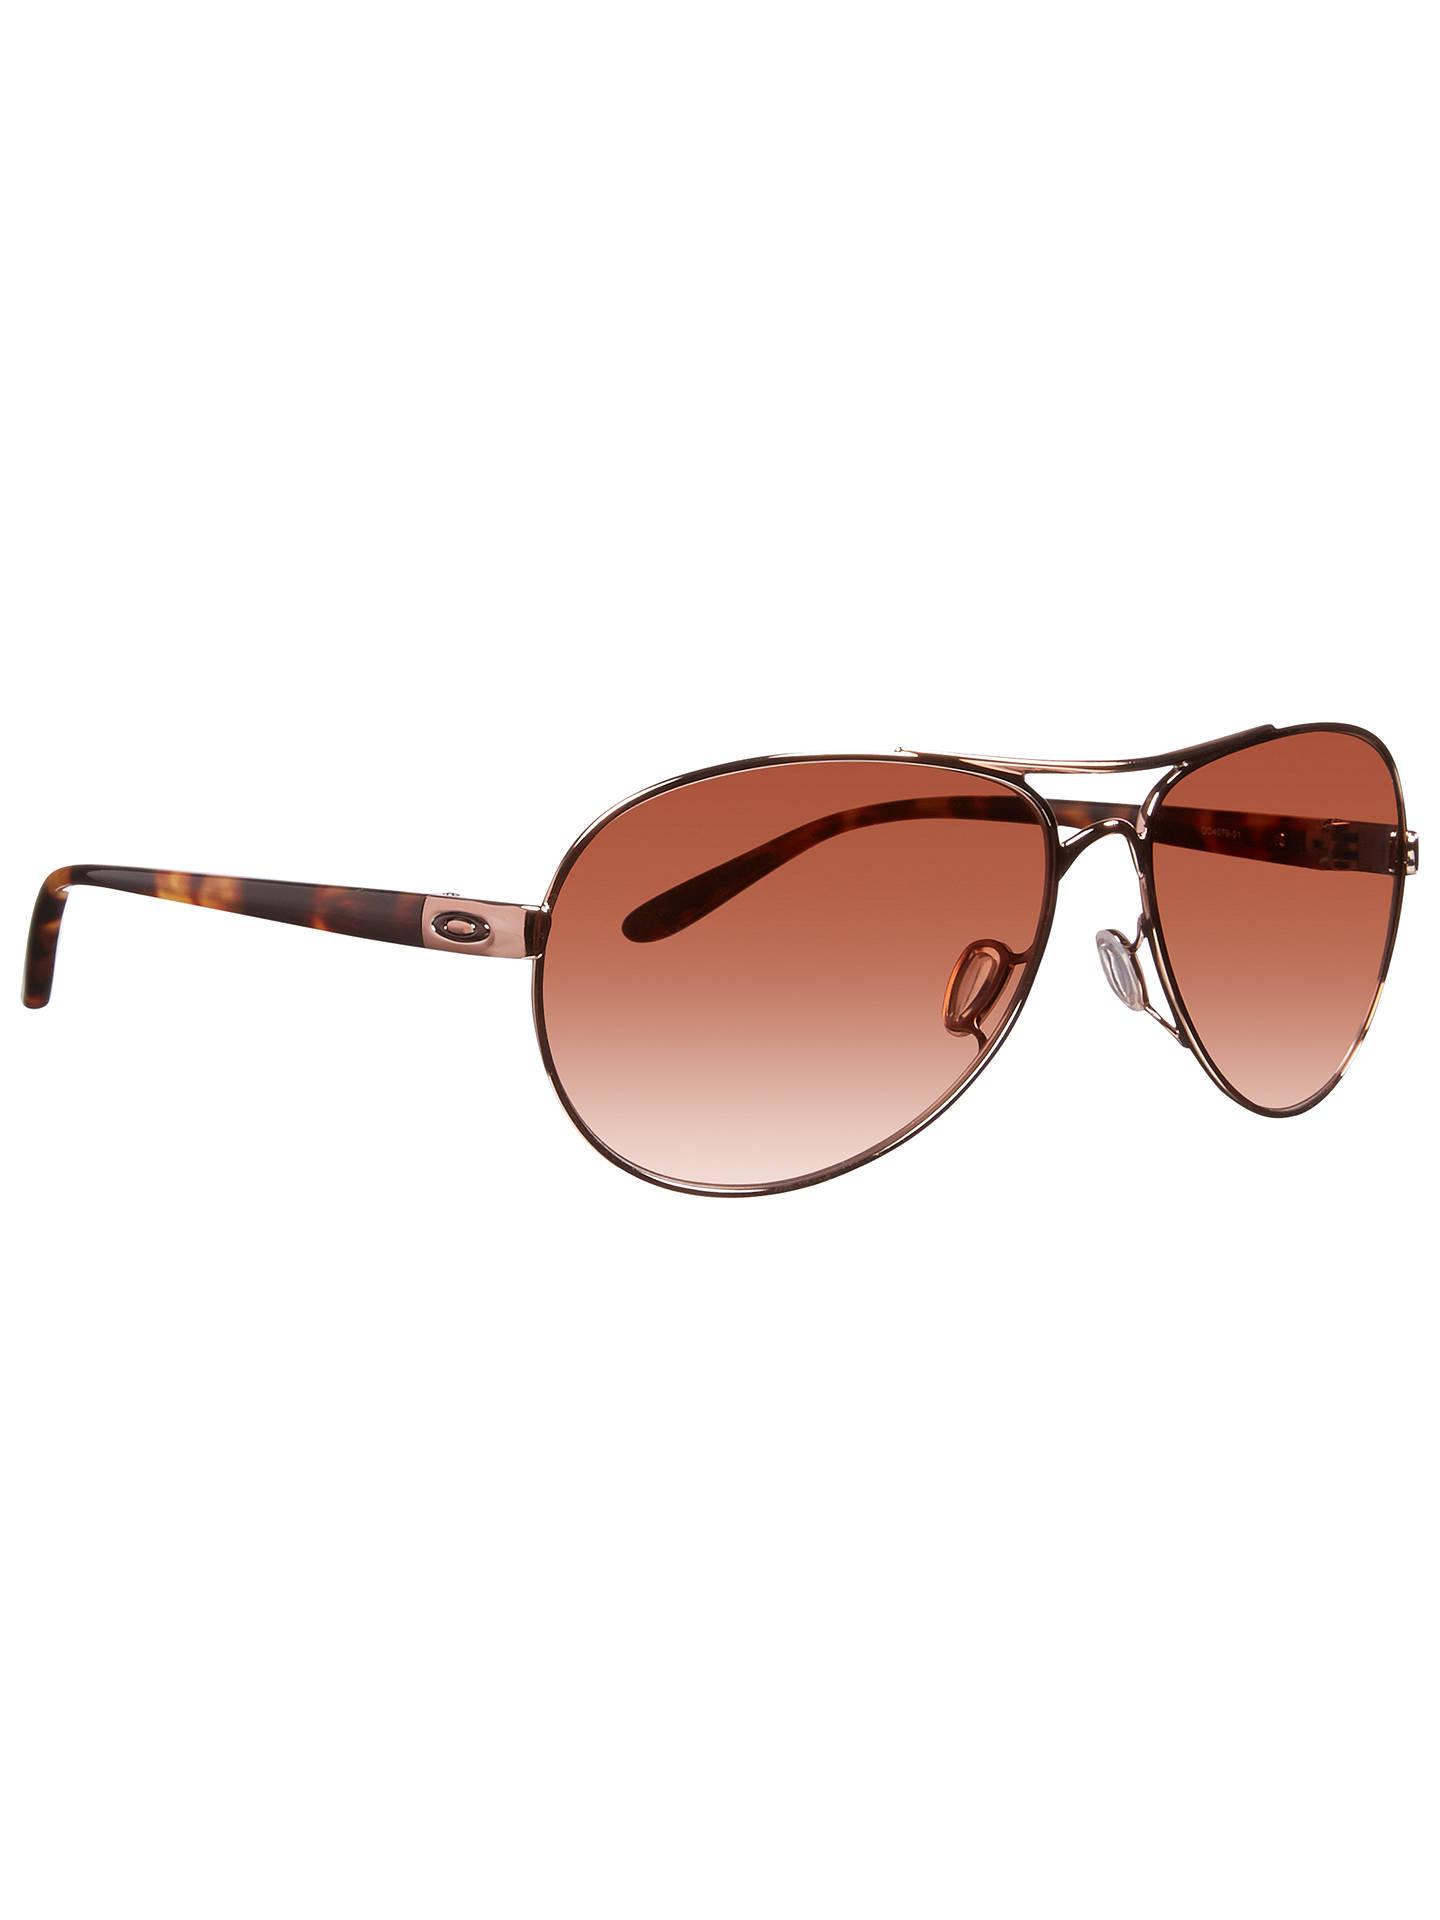 oakley feedback sunglasses clearance